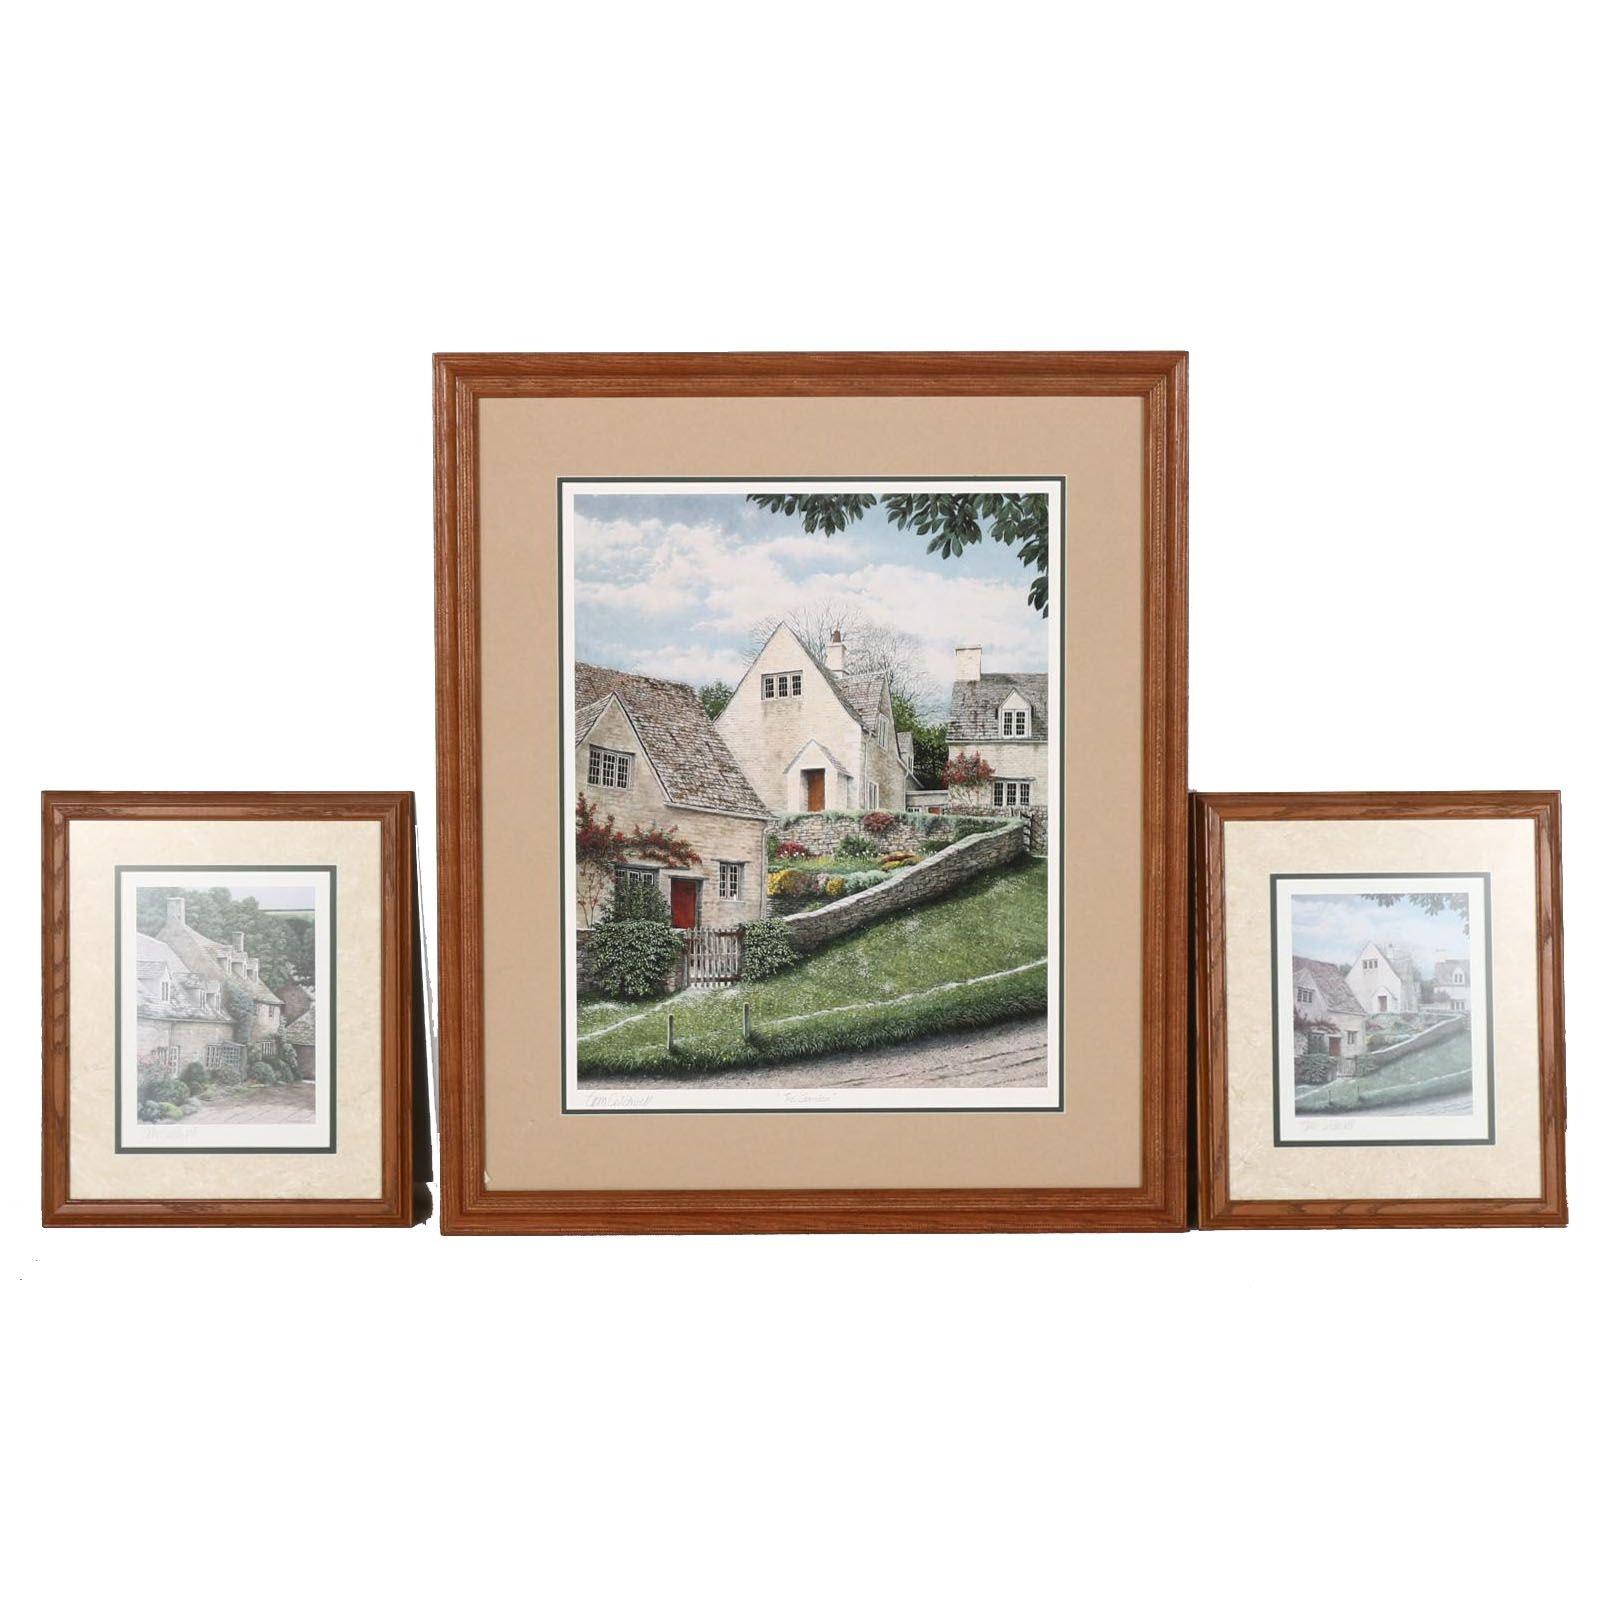 Framed Offset Lithographs after Tom Caldwell